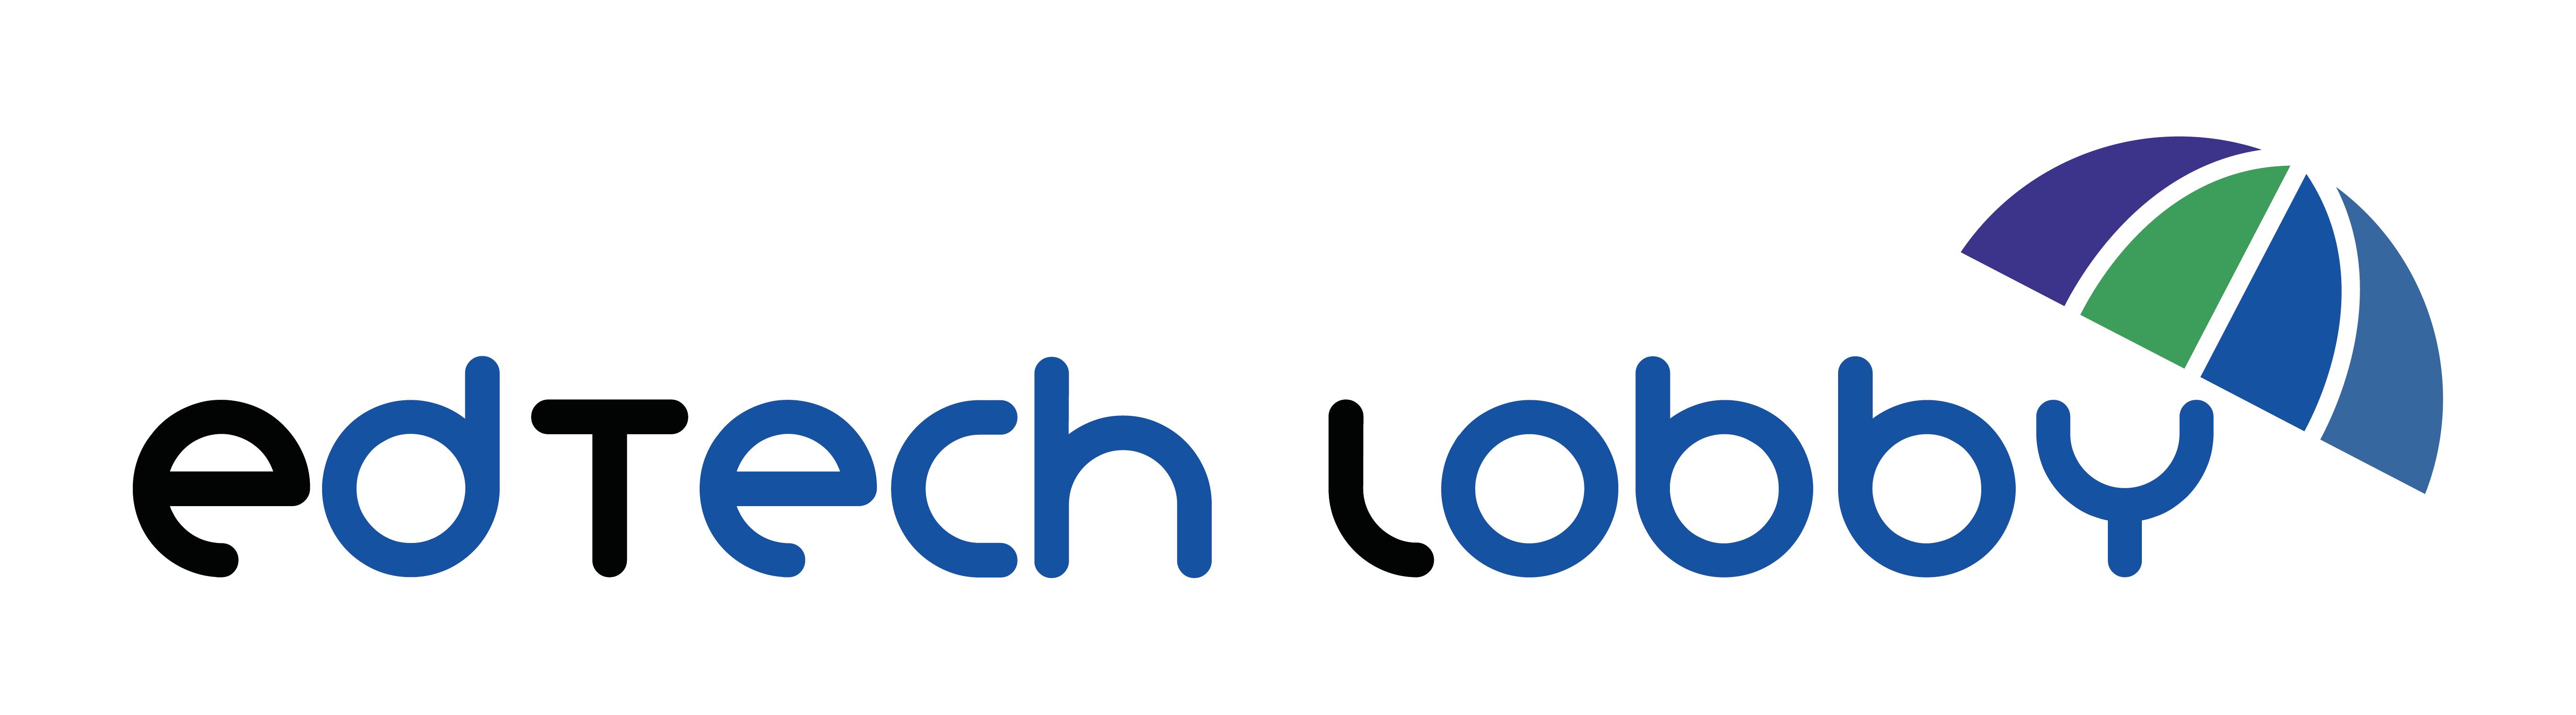 EdTech Lobby logo